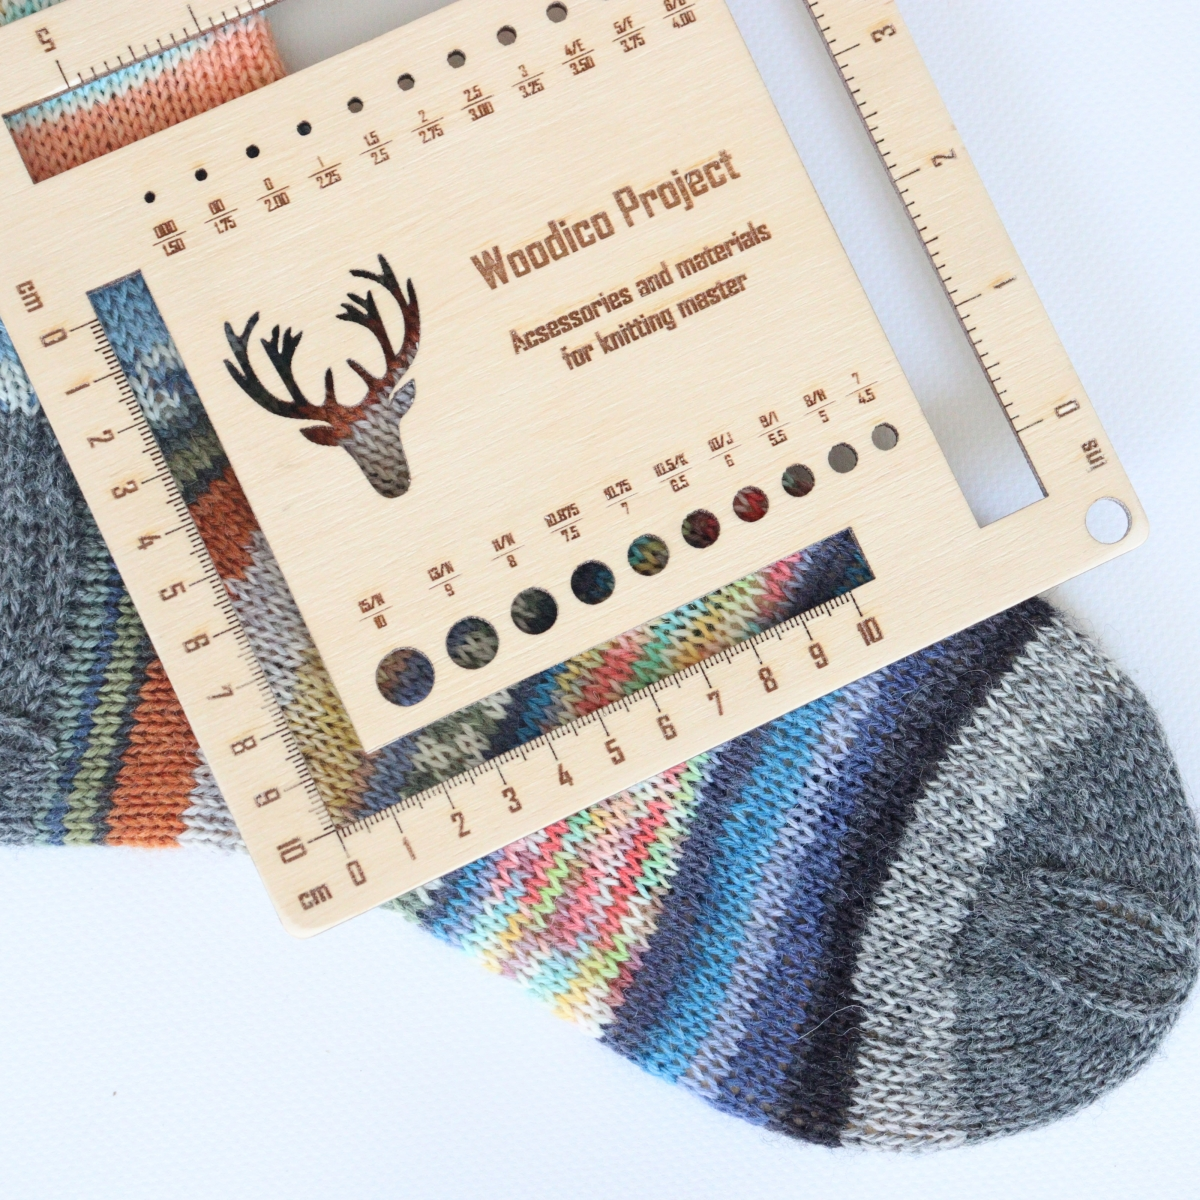 woodico.pro knitmetr 1200x1200 - Knitting needle gauge and ruler / Knitmetr